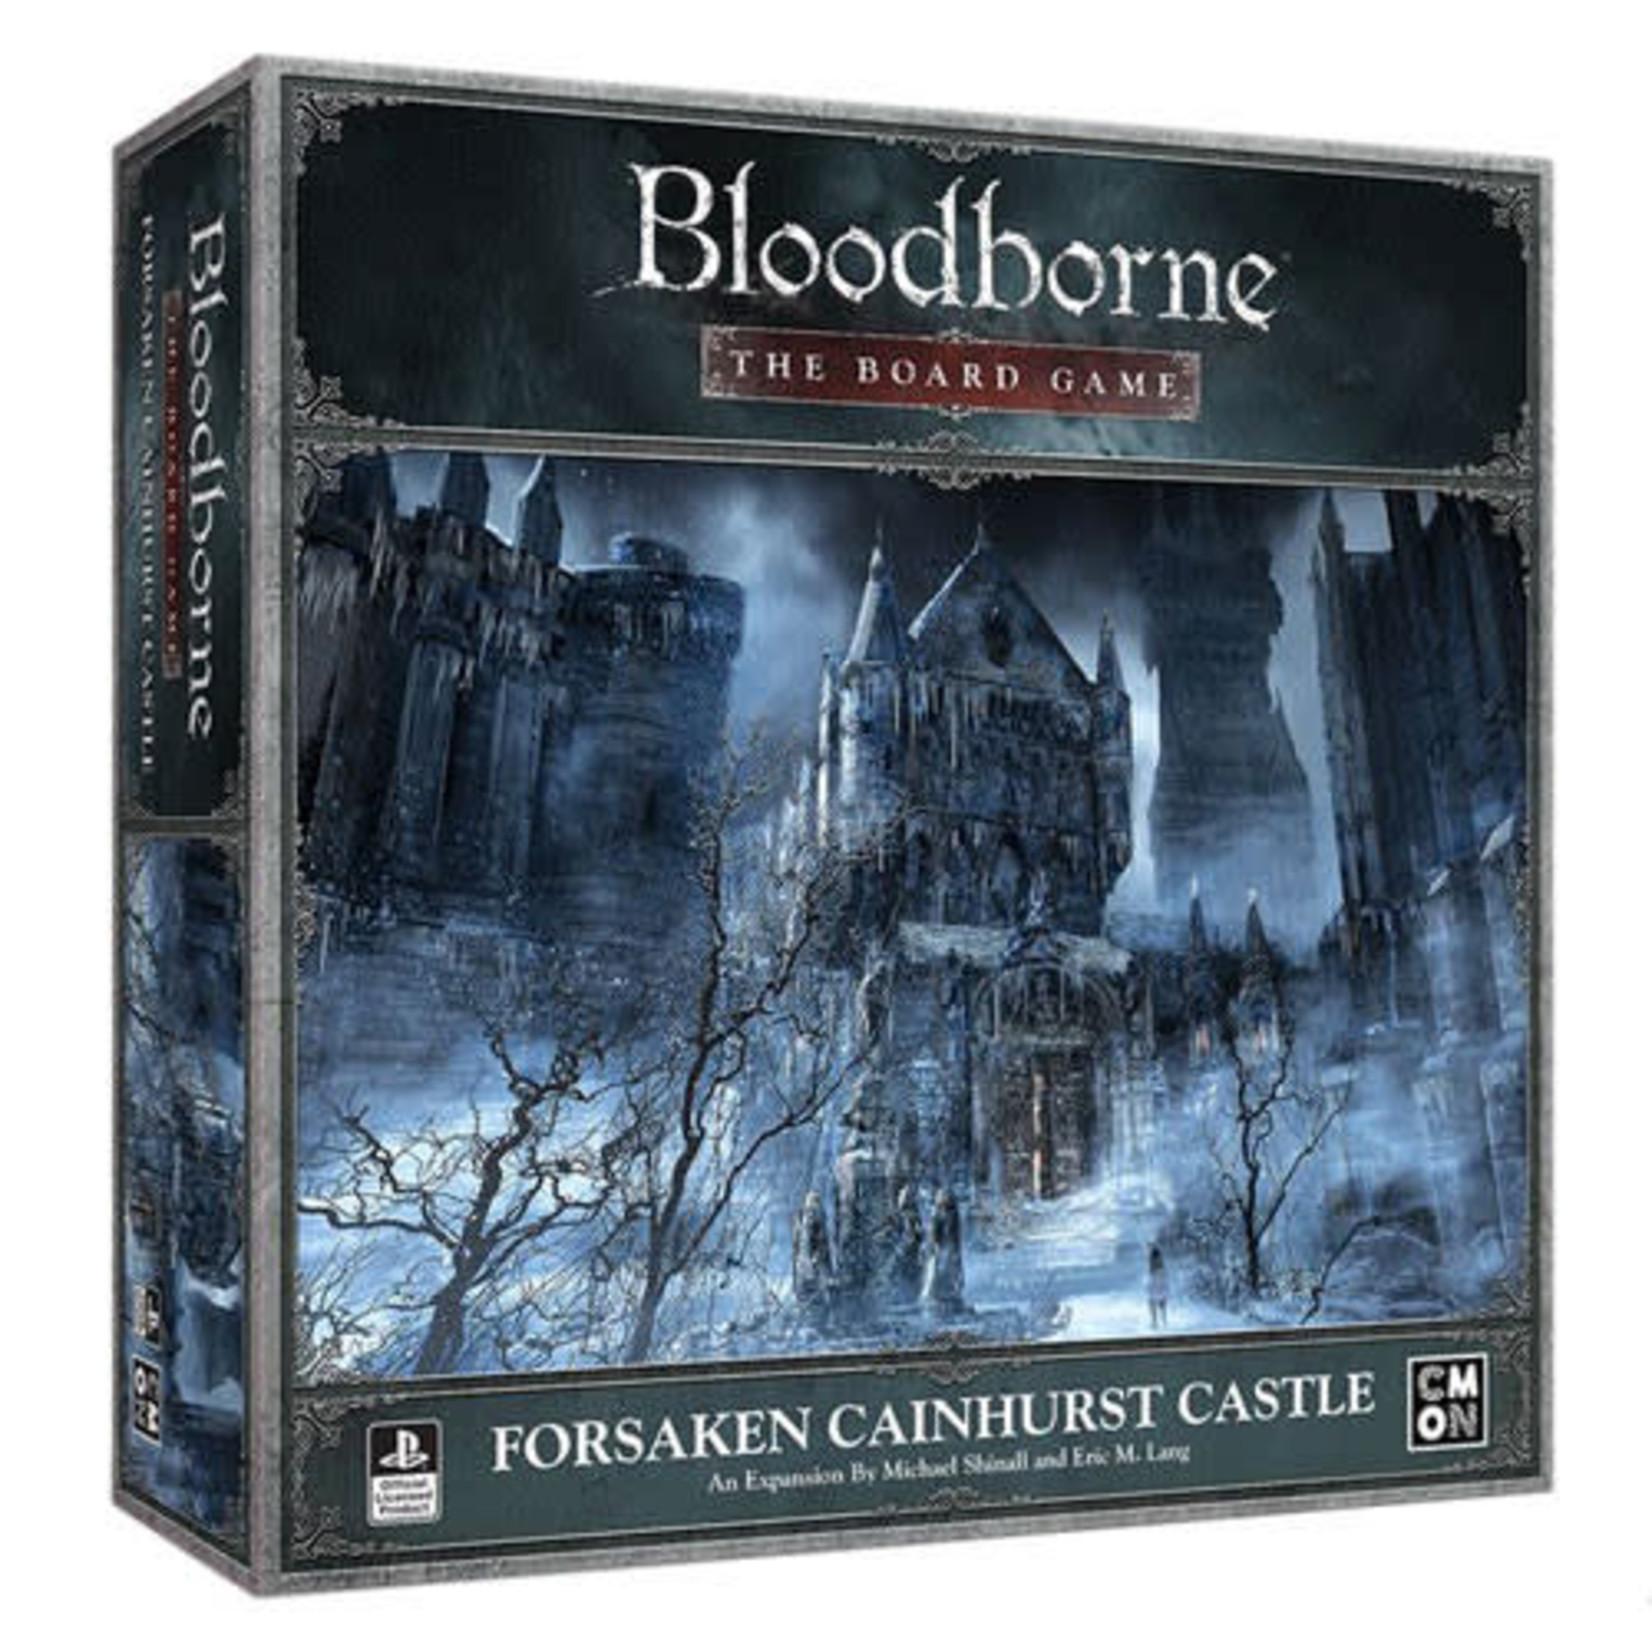 Bloodborne Foresaken Cainhurst